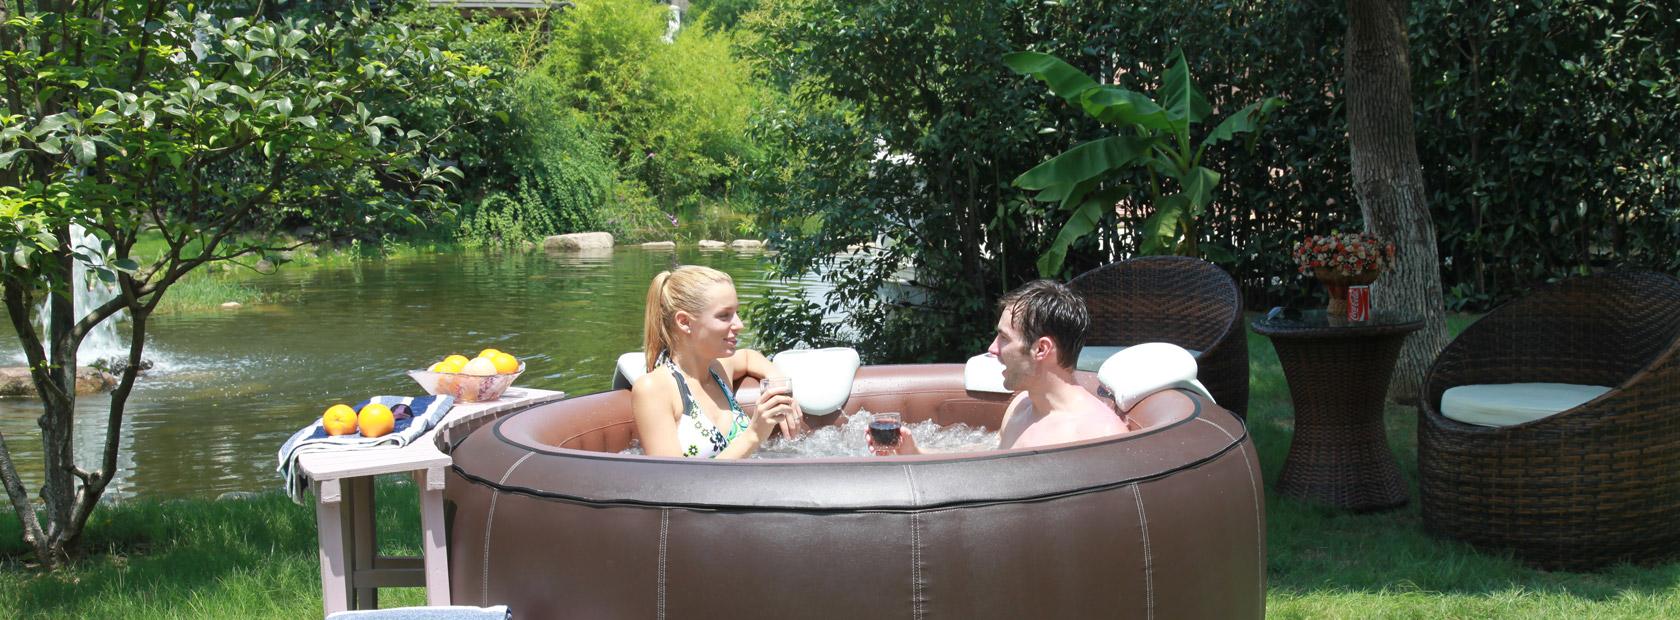 The Ultimate Inflatable Spa Aqua Spas